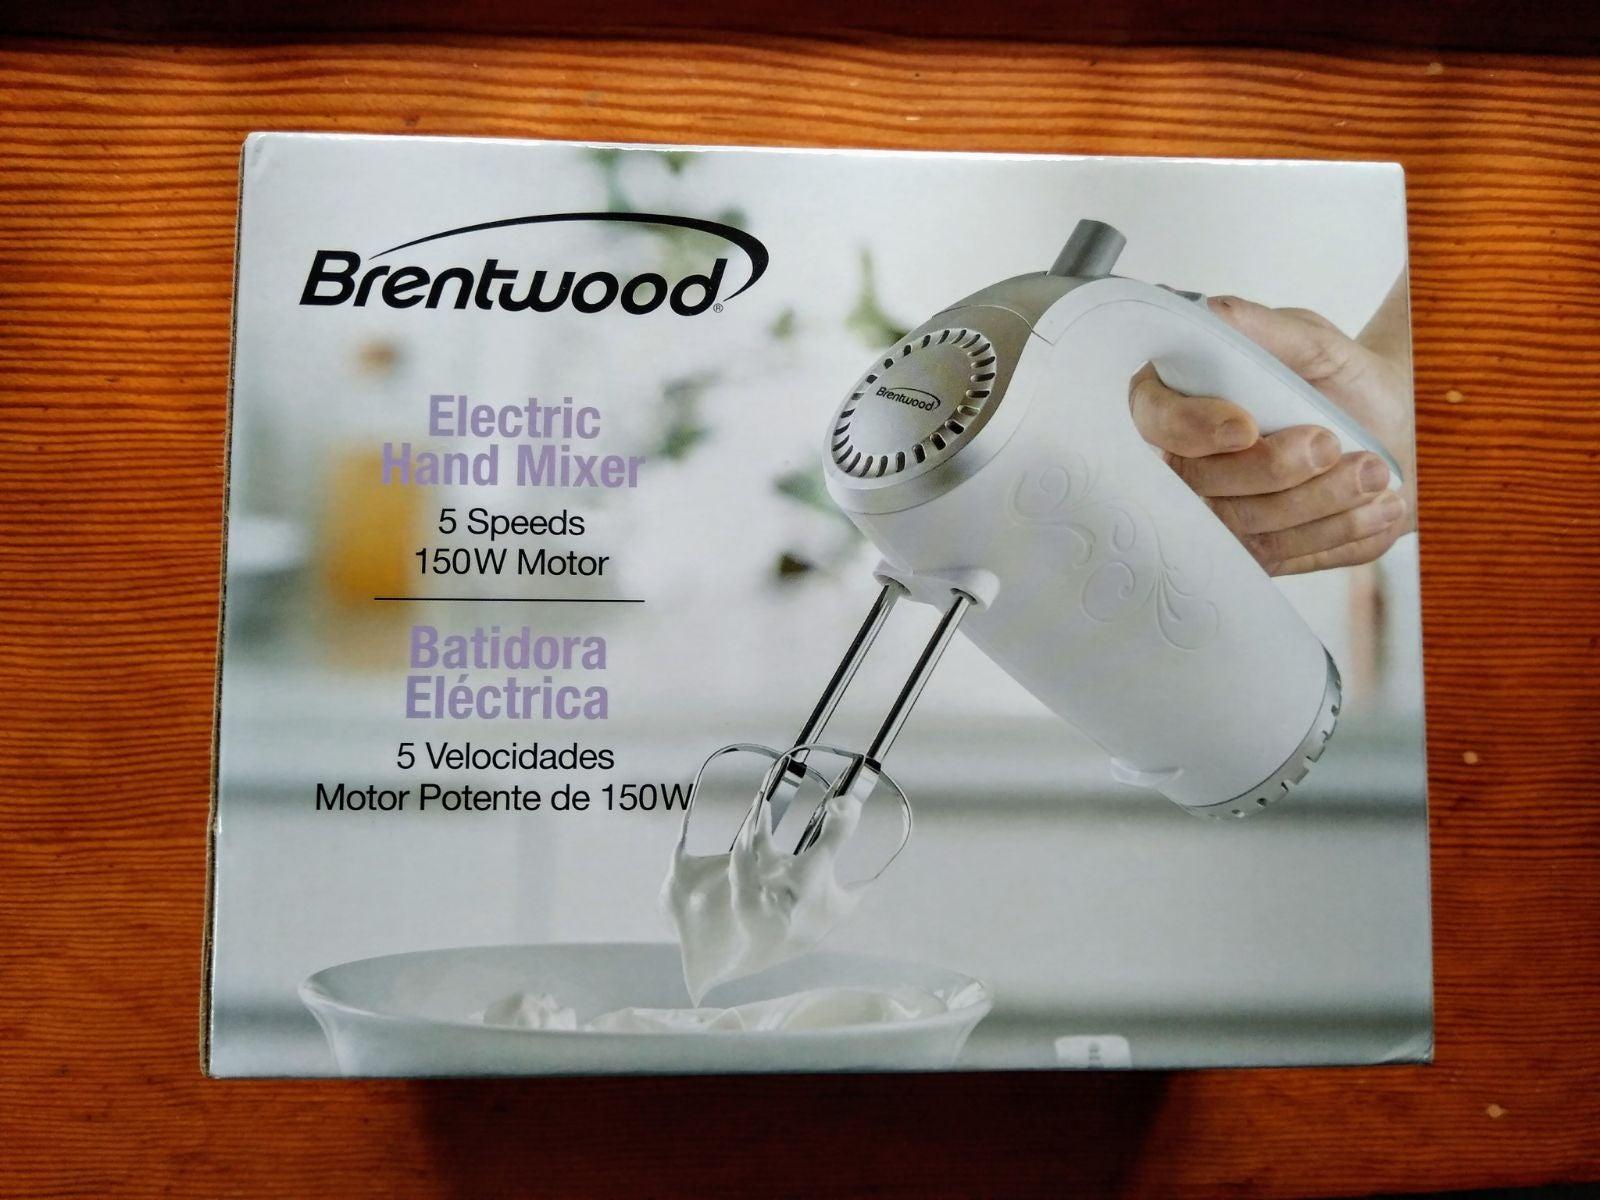 Brentwood 5-Speed Hand Mixer Baking